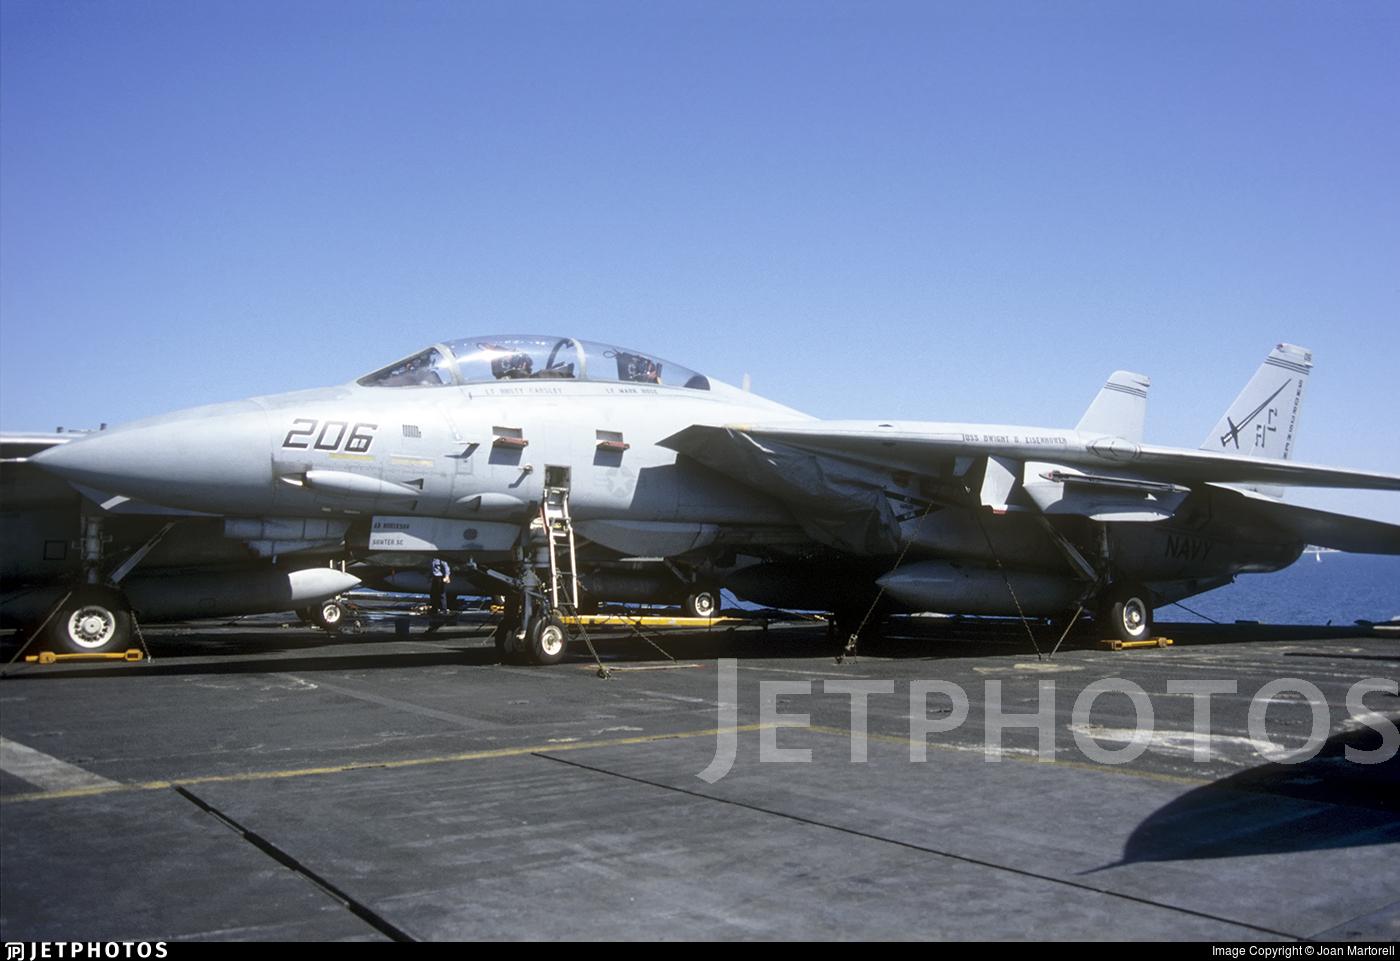 160900 - Grumman F-14A Tomcat - United States - US Navy (USN)